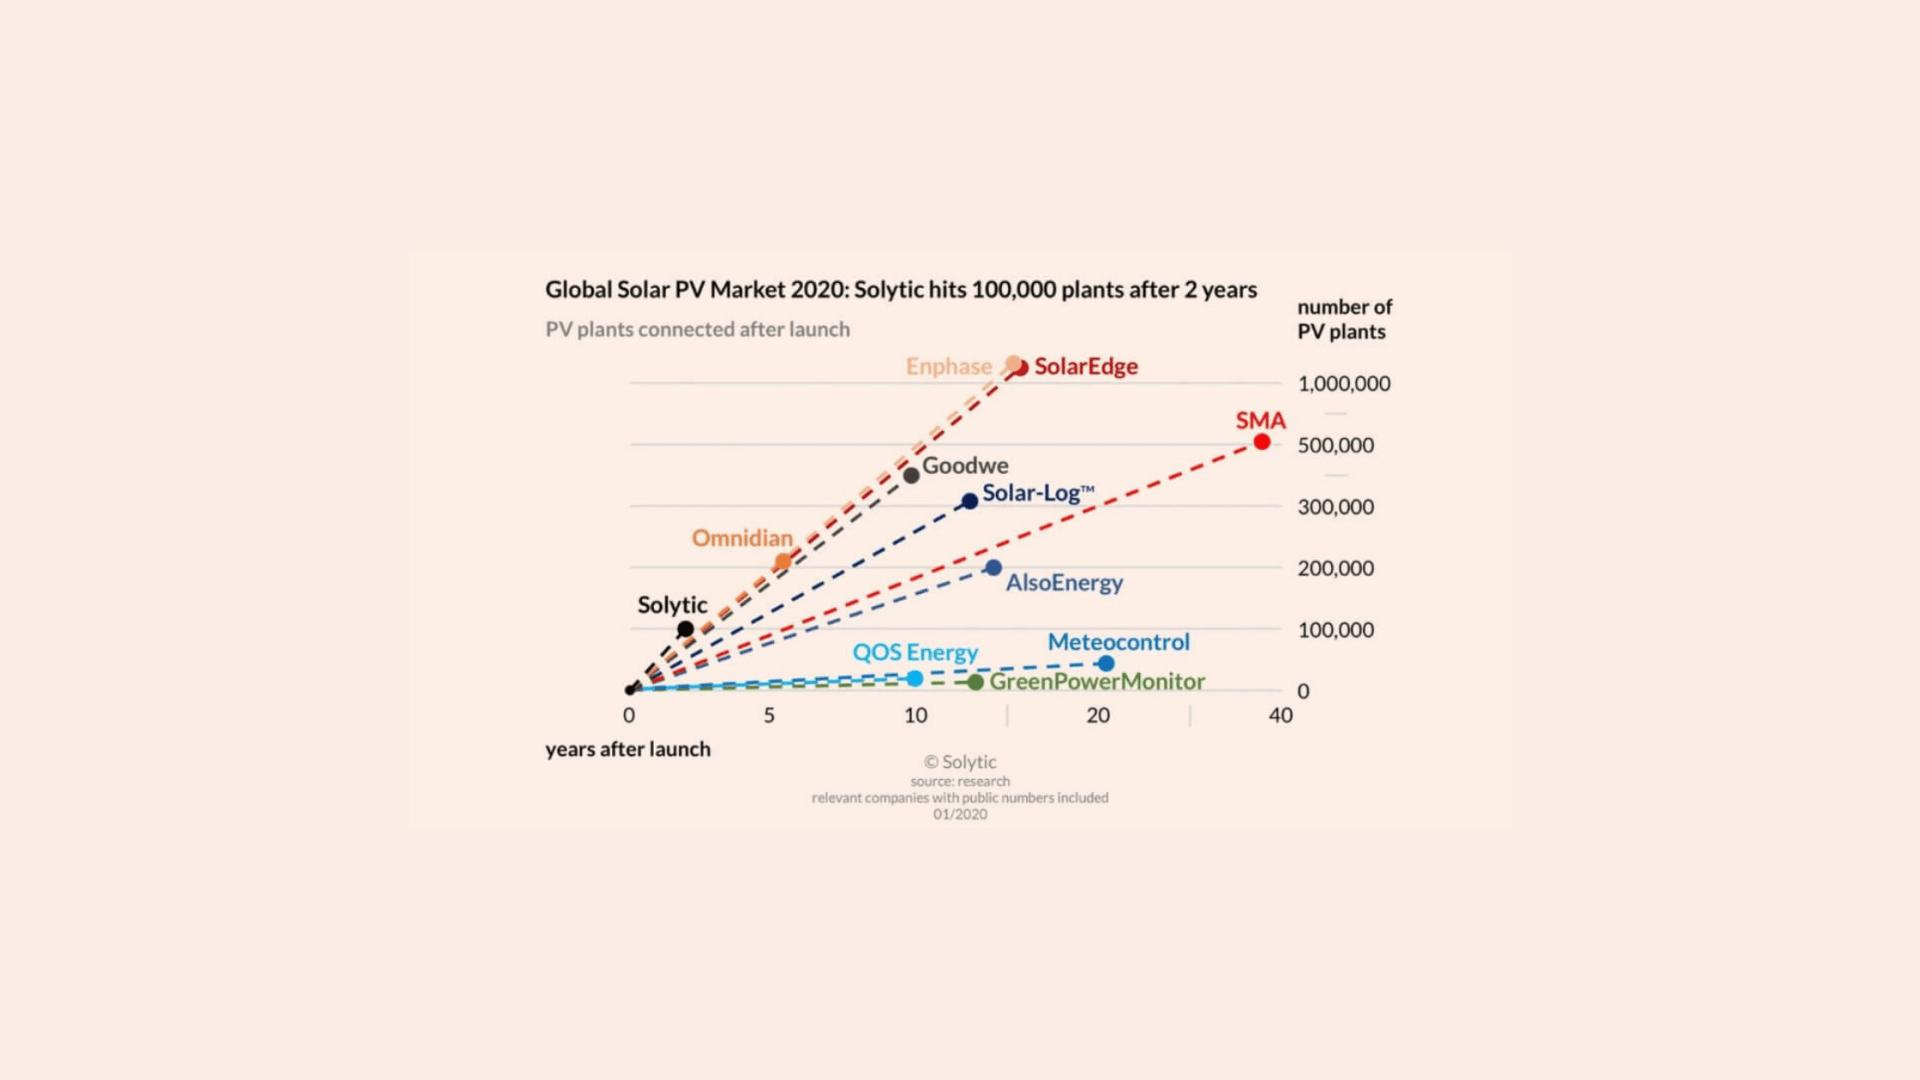 Global Solar PV Market 2020